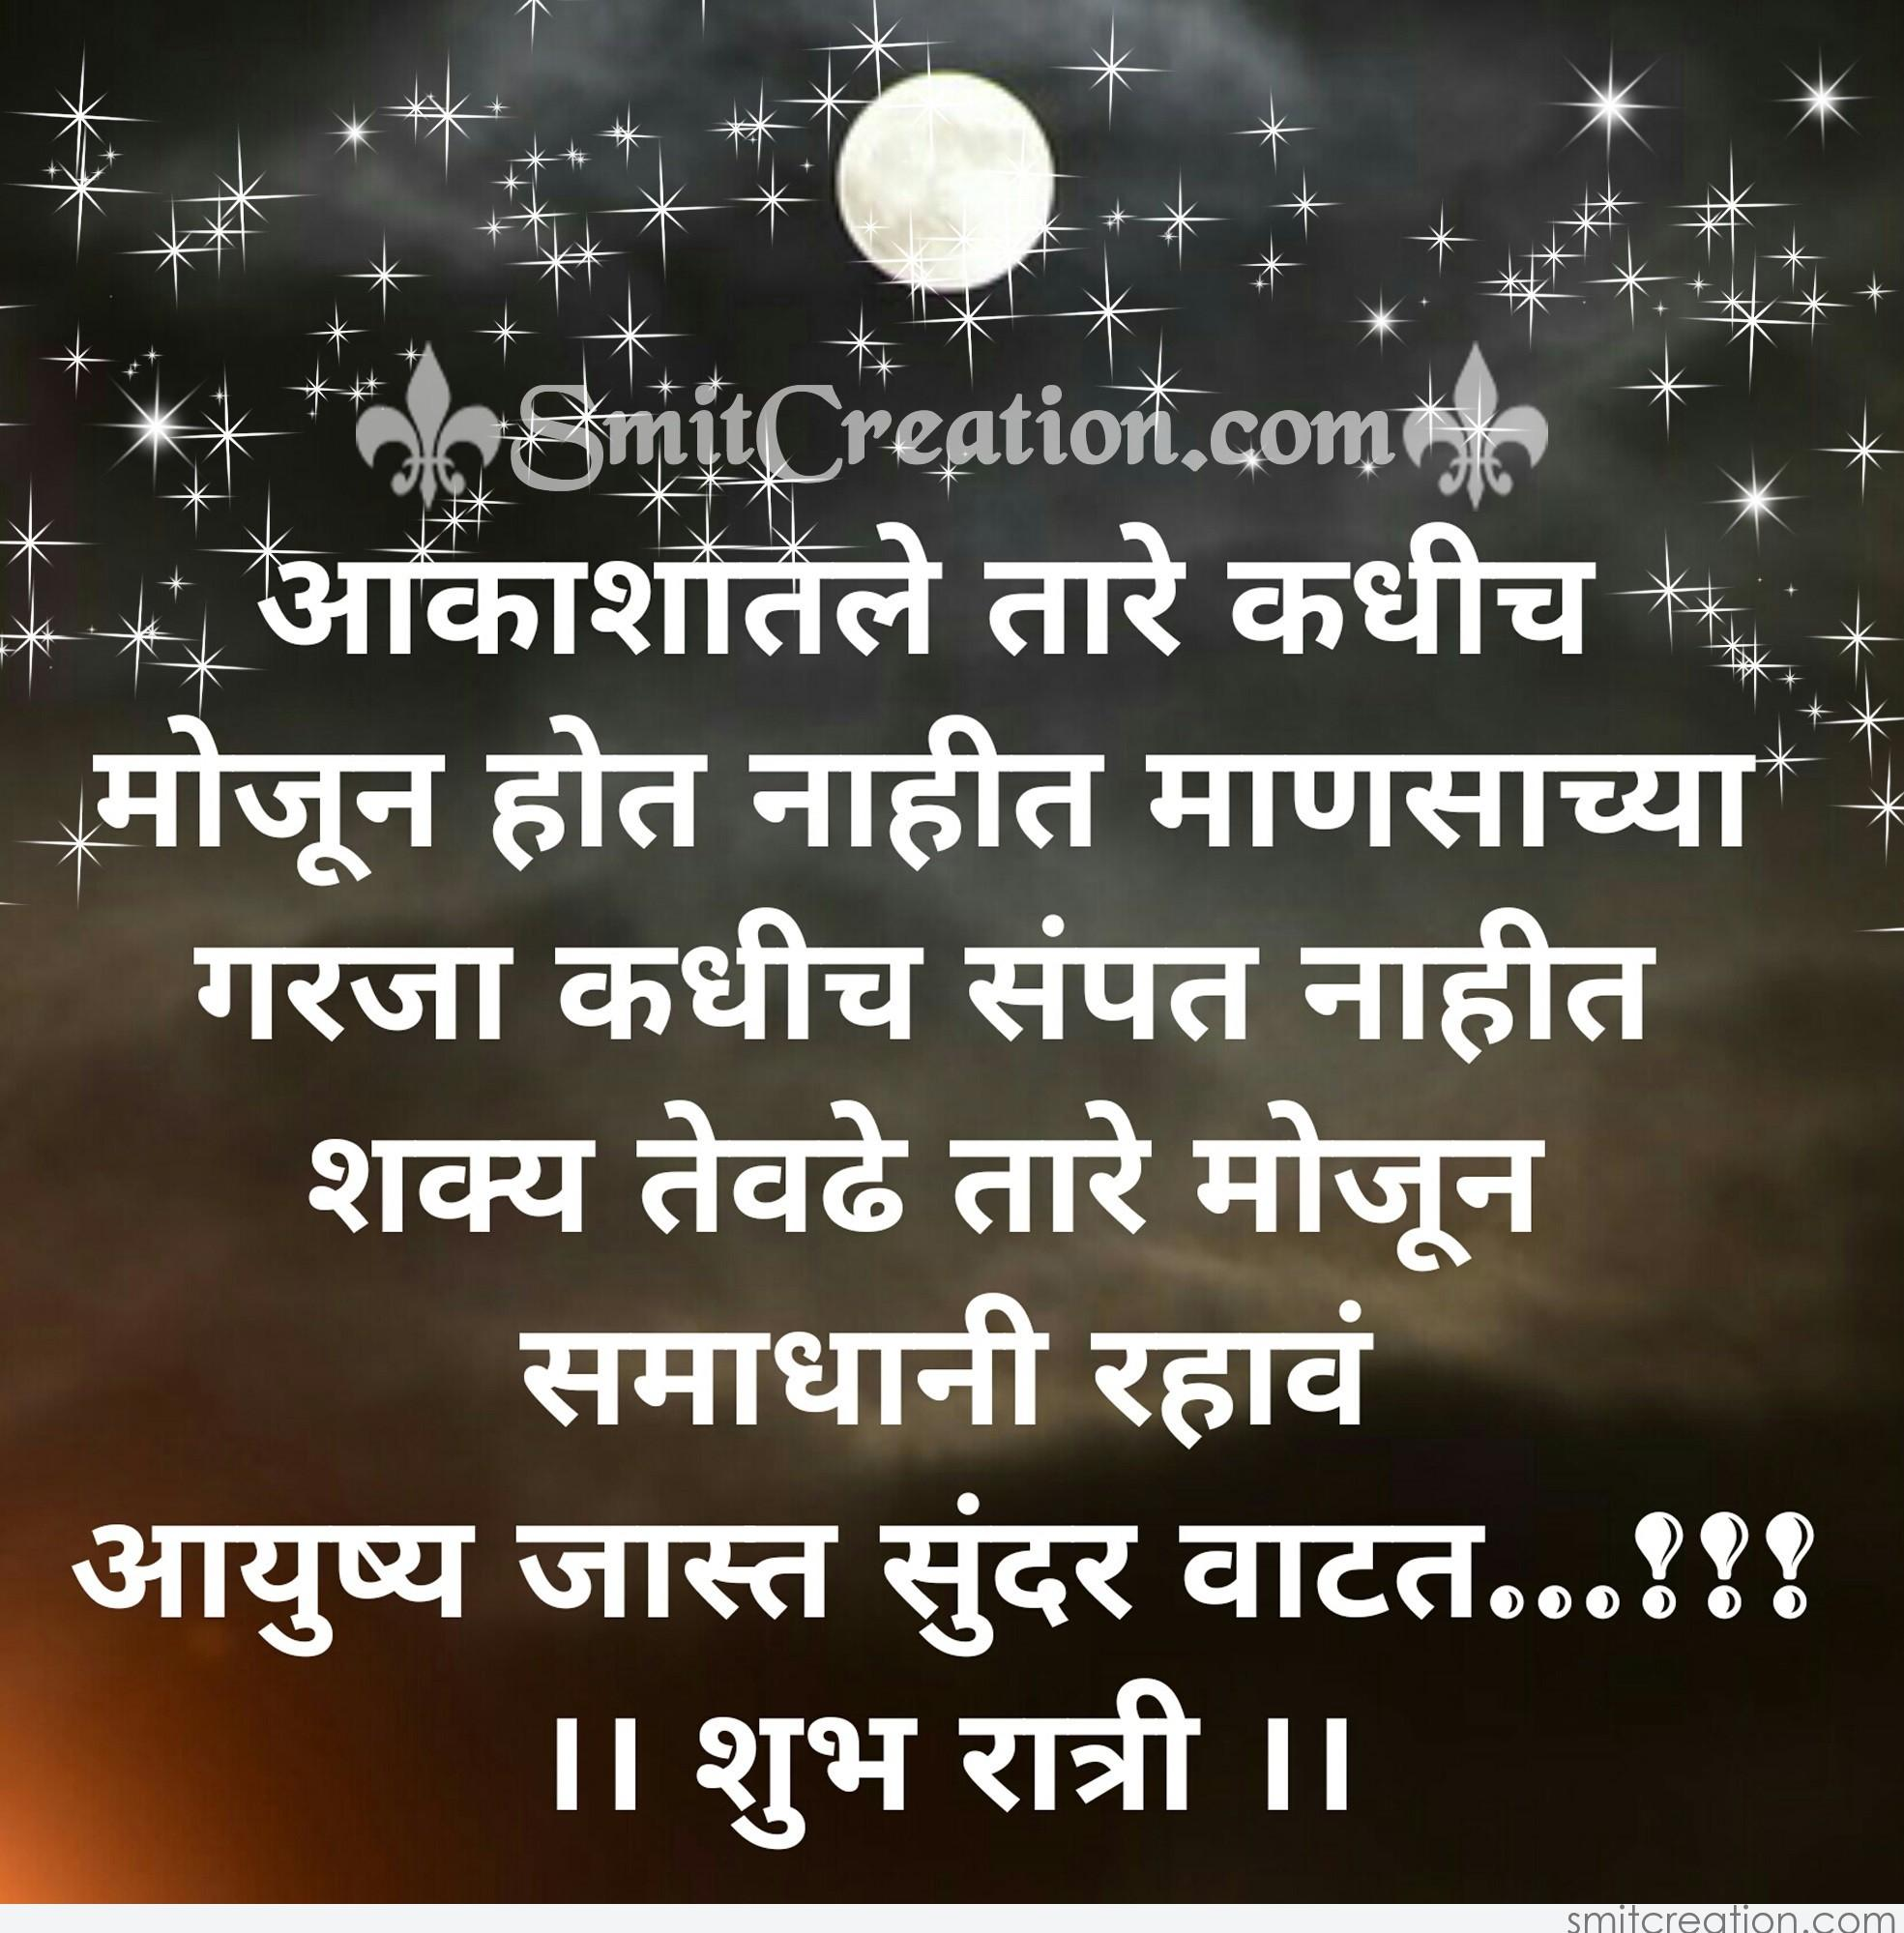 Shubh Ratri Marathi Quote